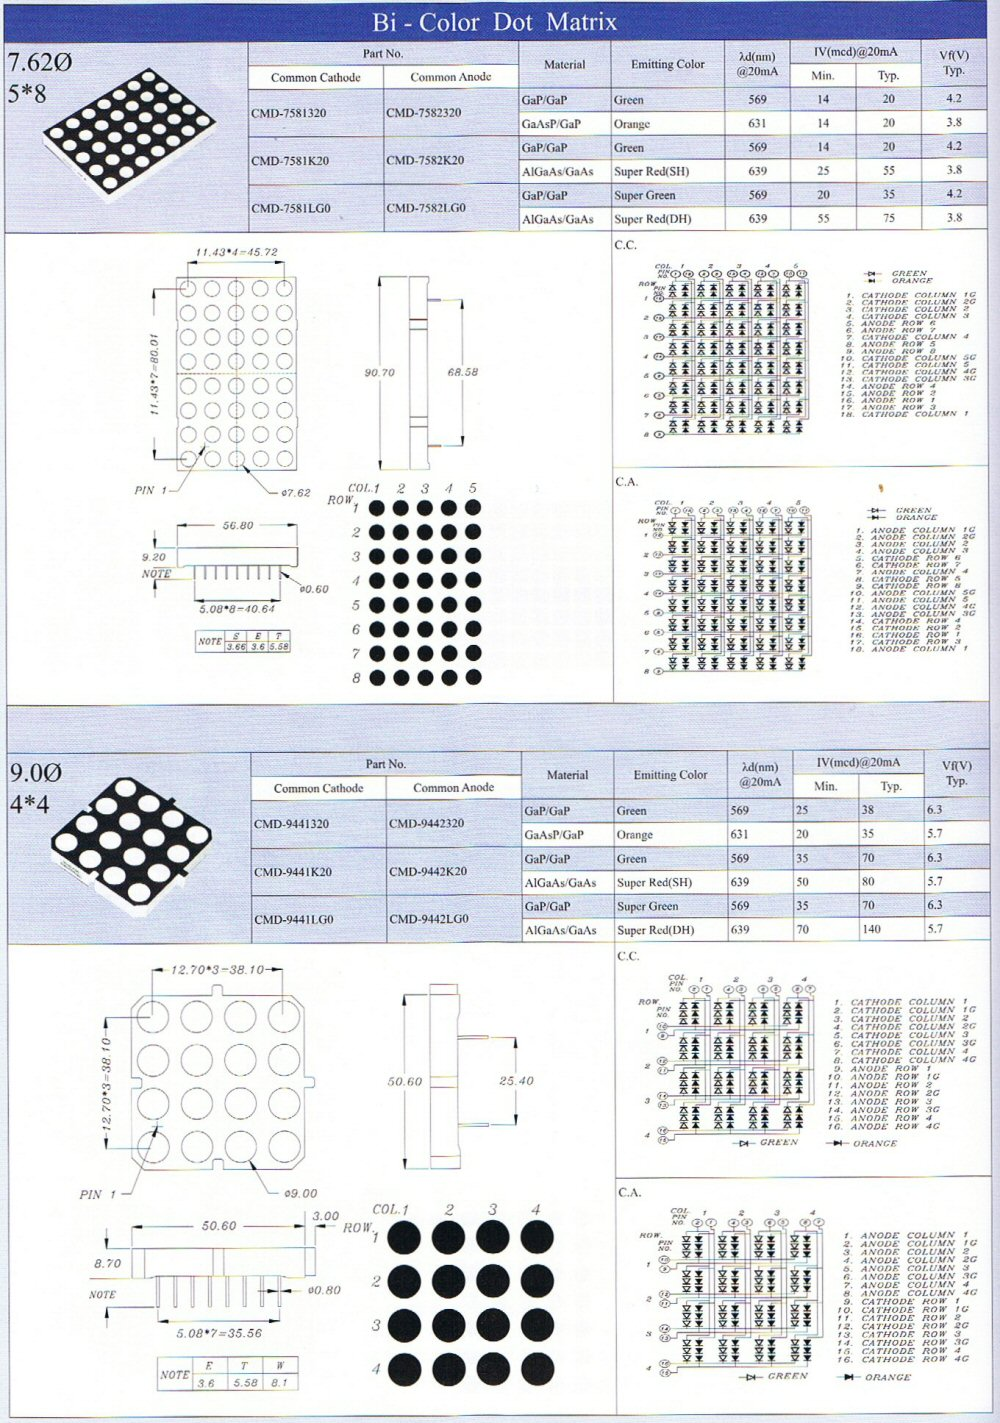 bi_color_dot_matrix_display7.jpg